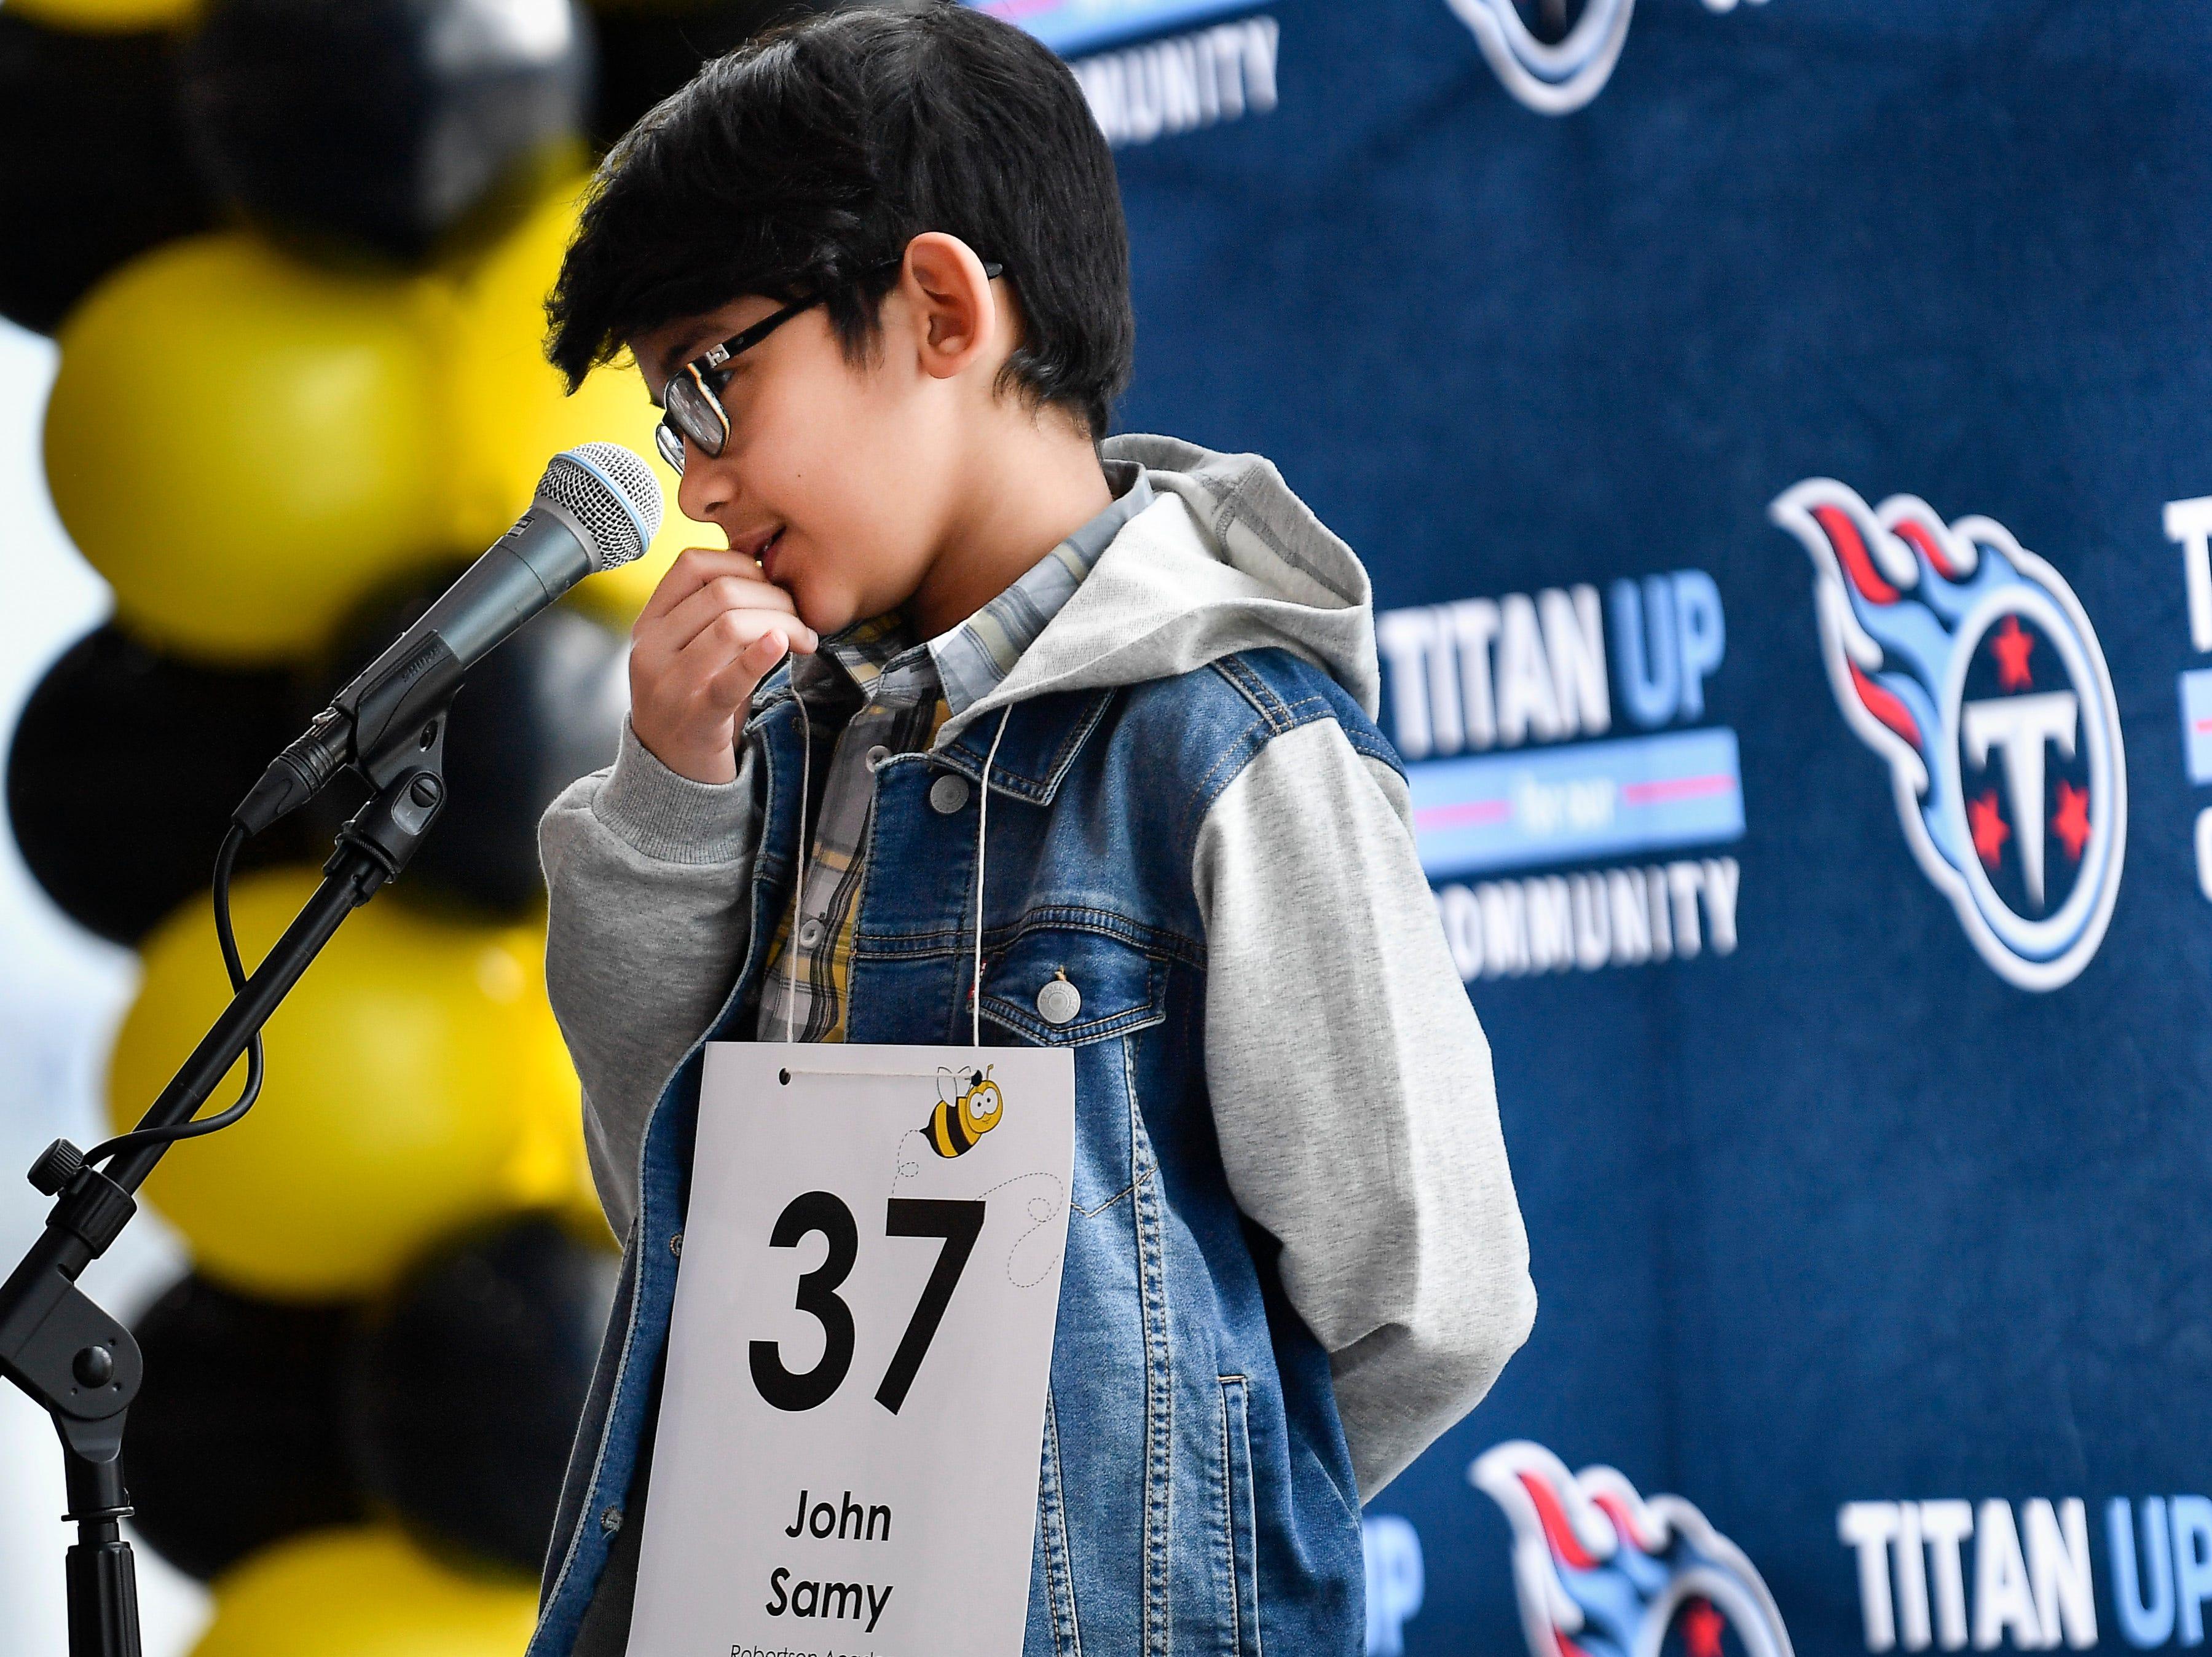 John Samy competes in the Tennessee Titans Regional Spelling Bee at Nissan Stadium Saturday, Feb. 16, 2019 in Nashville, Tenn.